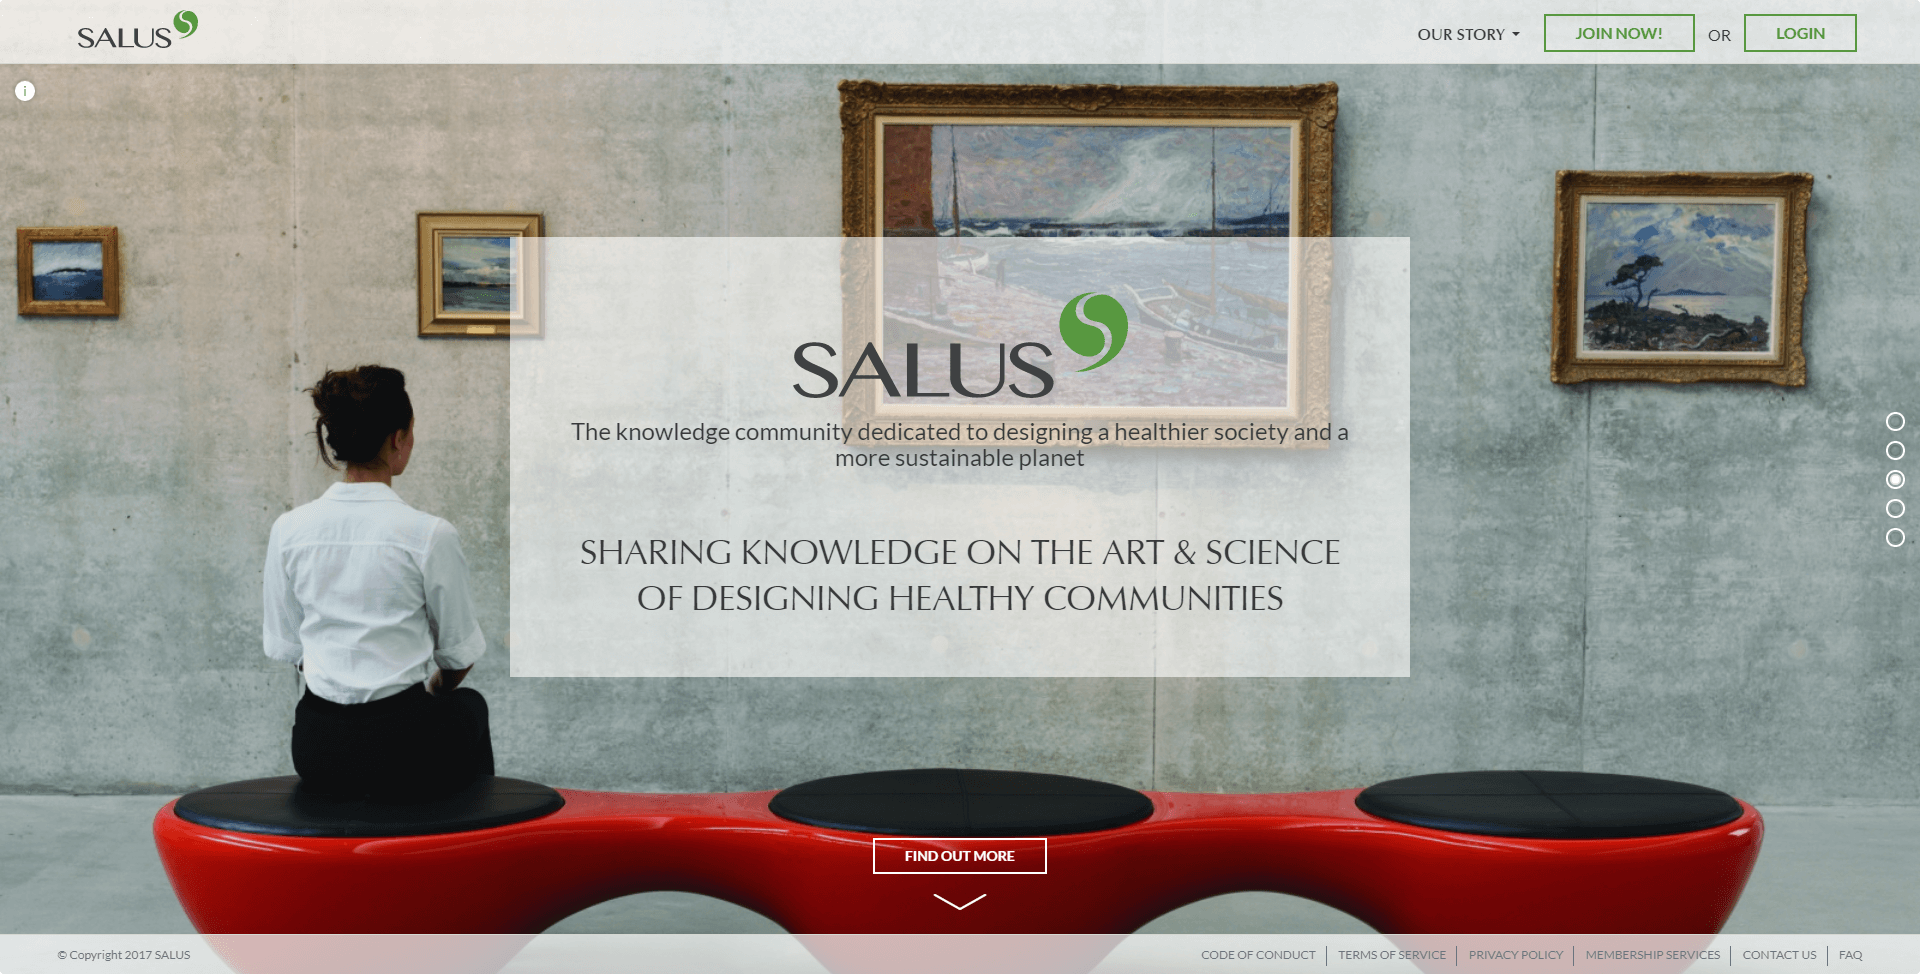 SALUS social network